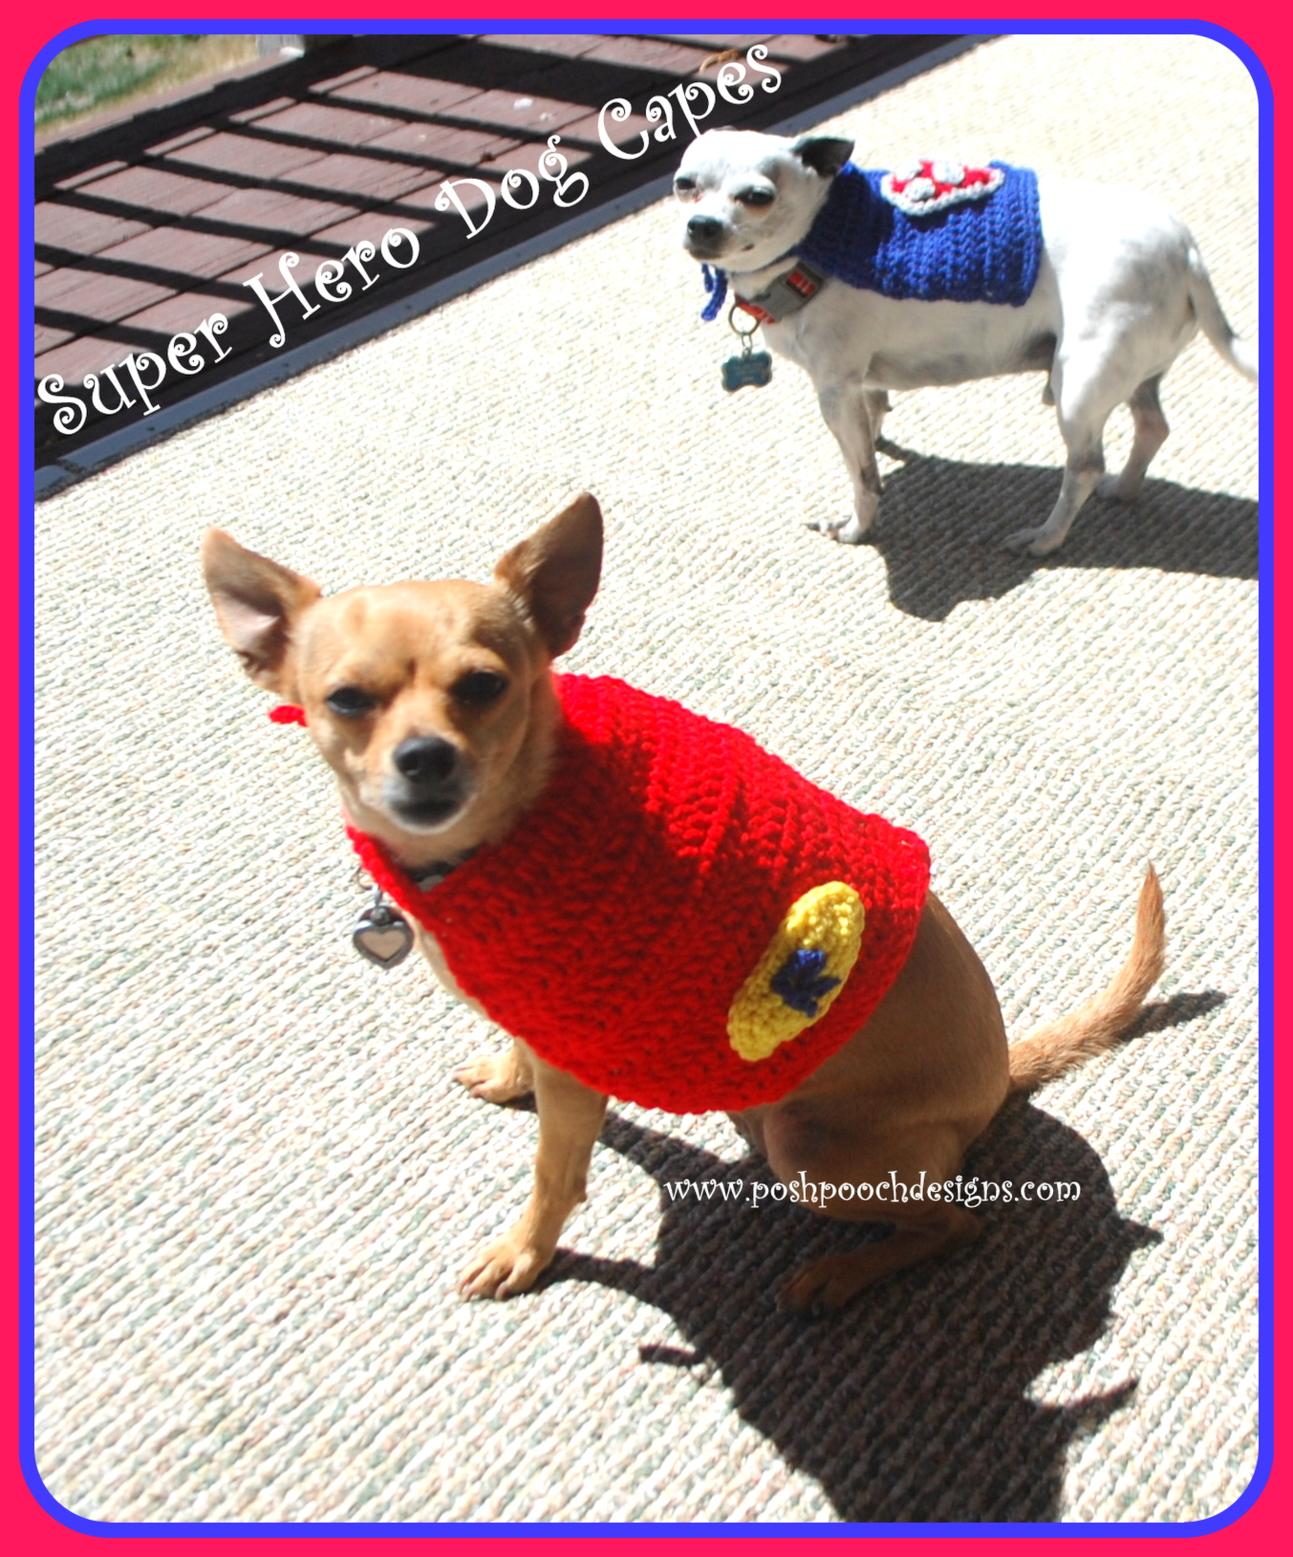 Posh Pooch Designs Dog Clothes: Super Hero Dog Cape Free Crochet ...